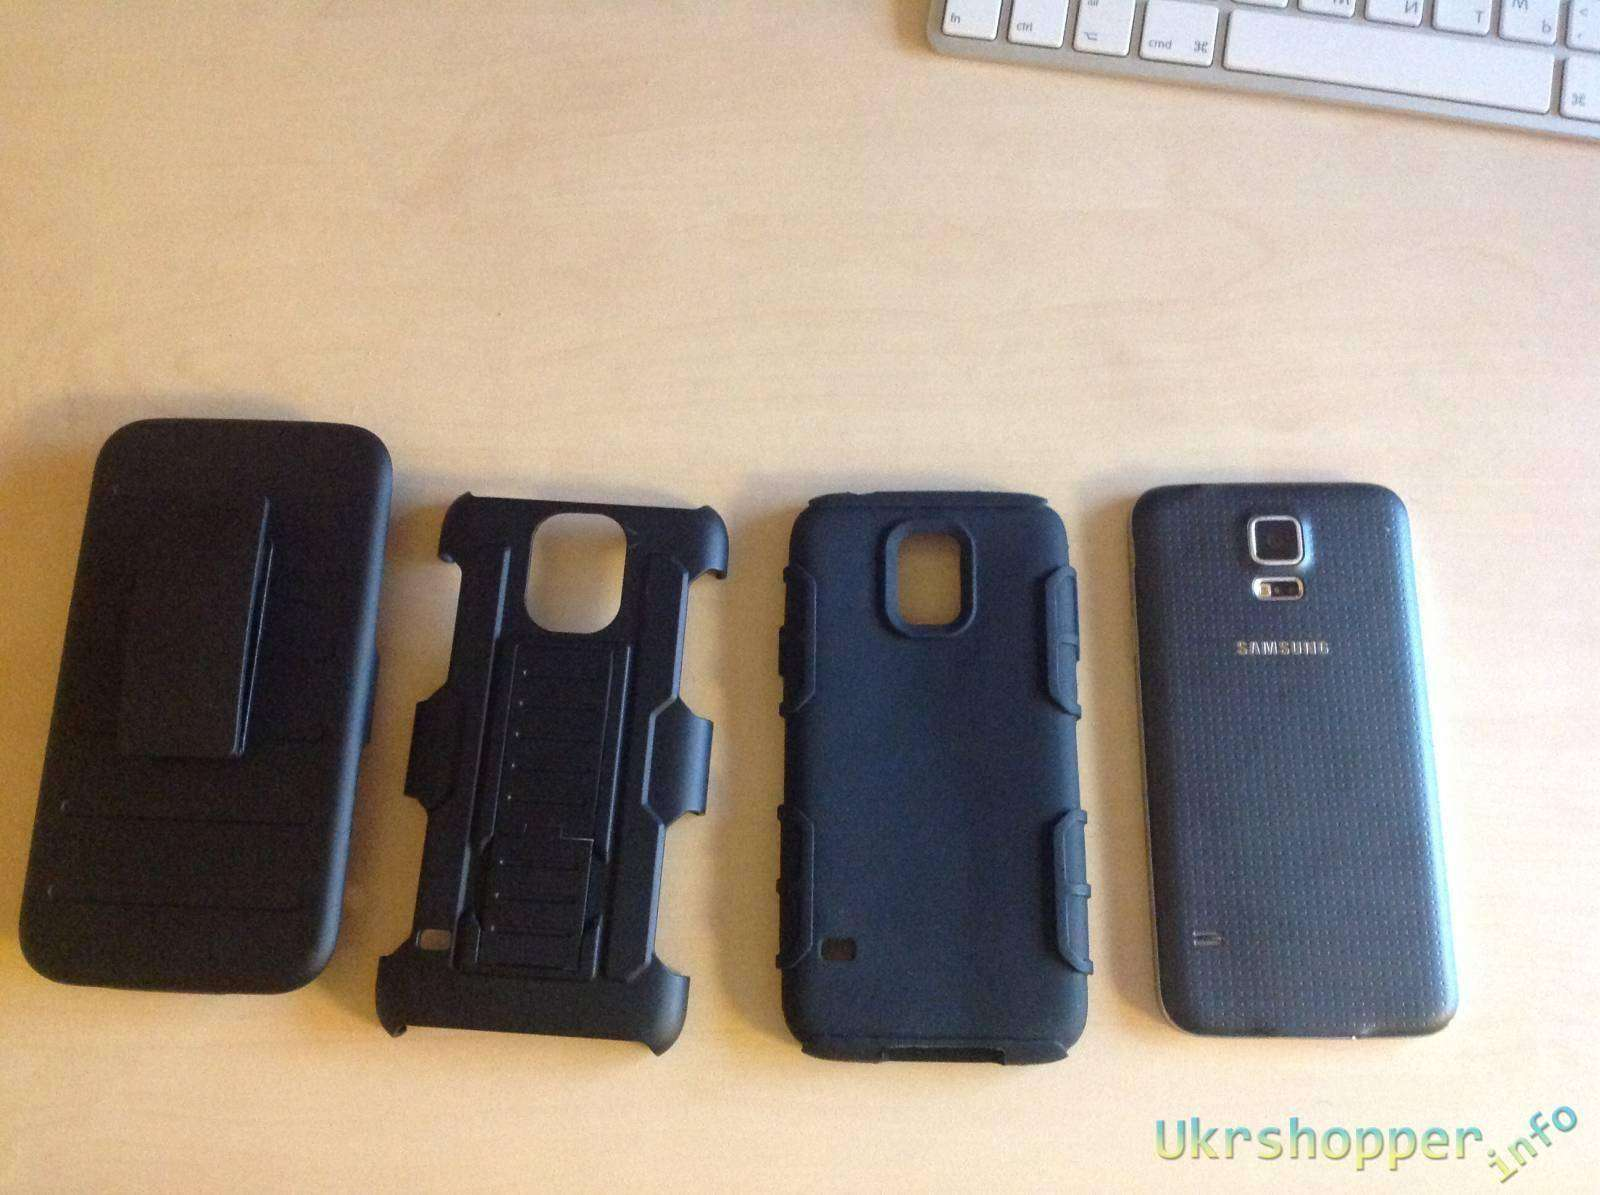 Aliexpress: Прекрасный чехол на Samsung Galaxy s5